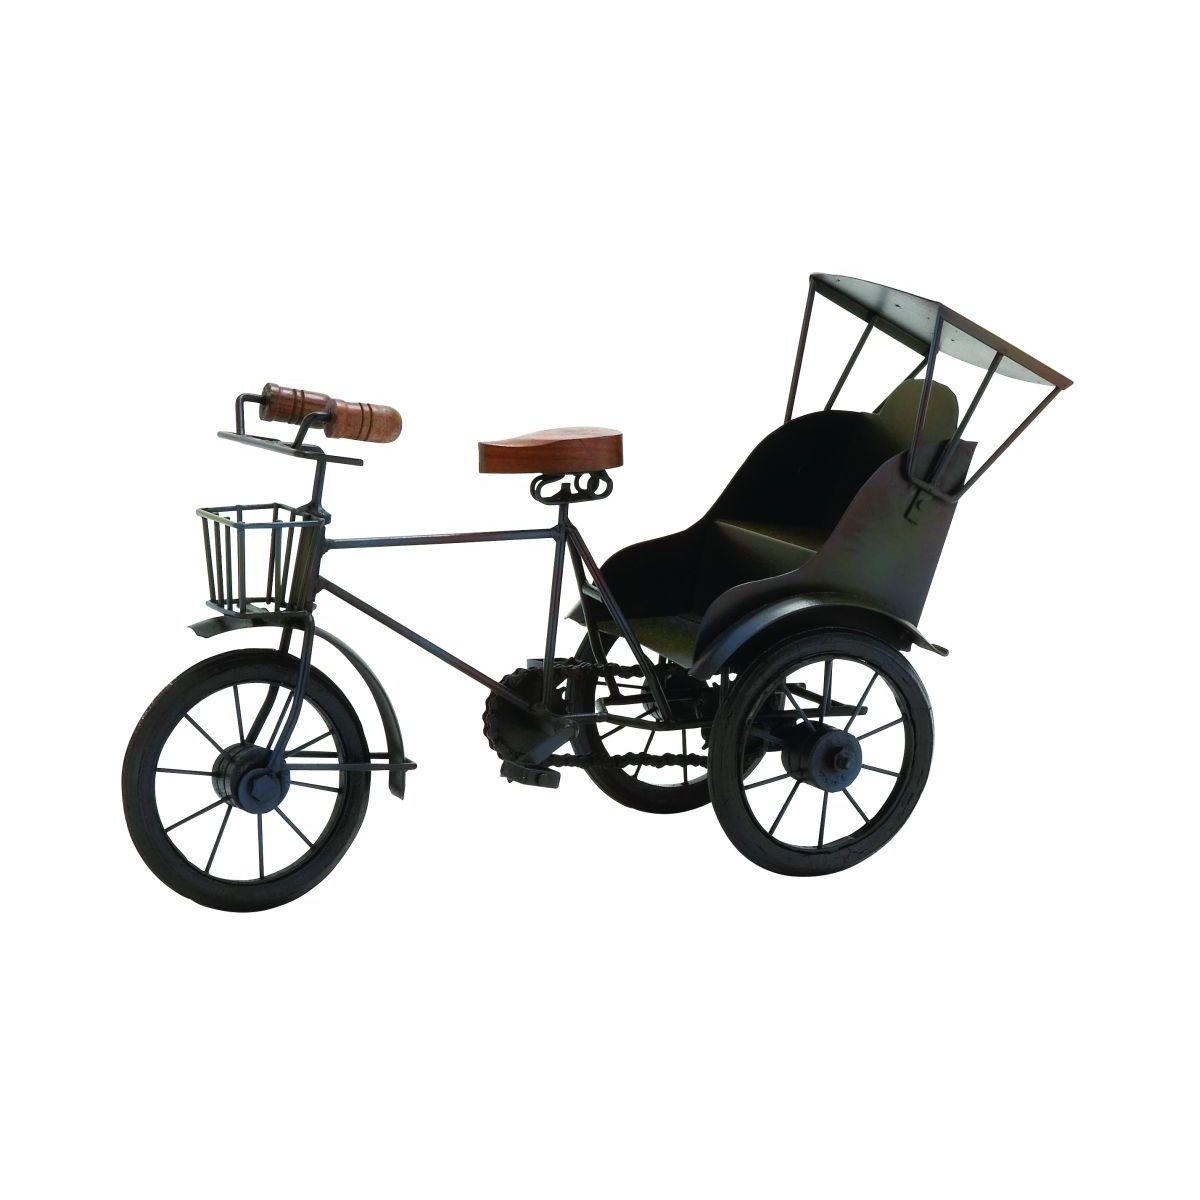 Brown Wood and Metal Tricycle Figurine